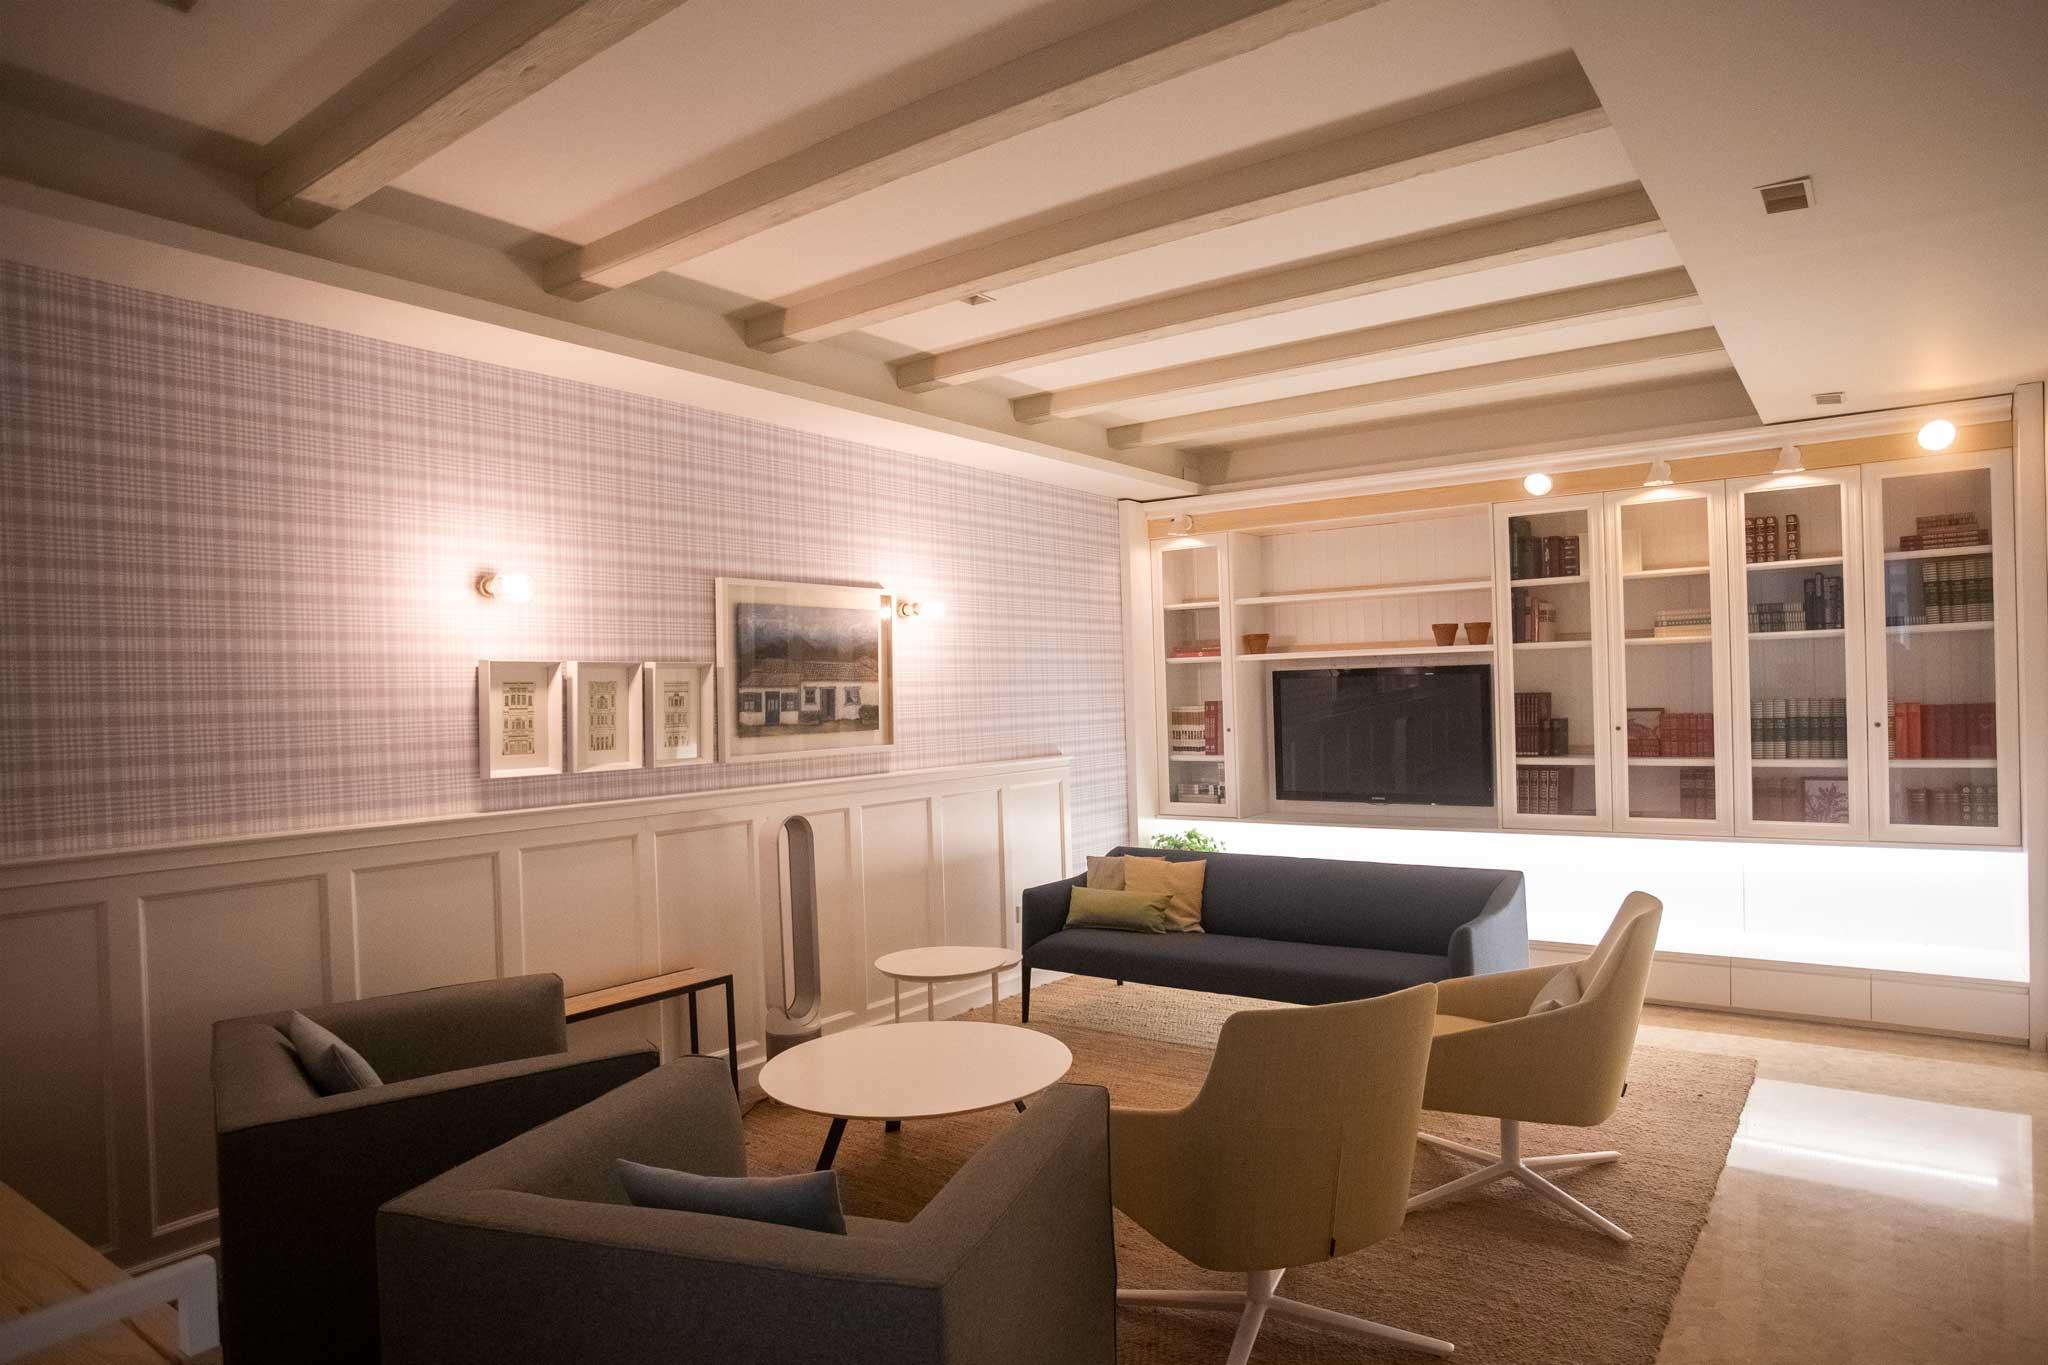 Hotel relax Denia – Hotel Los Angeles